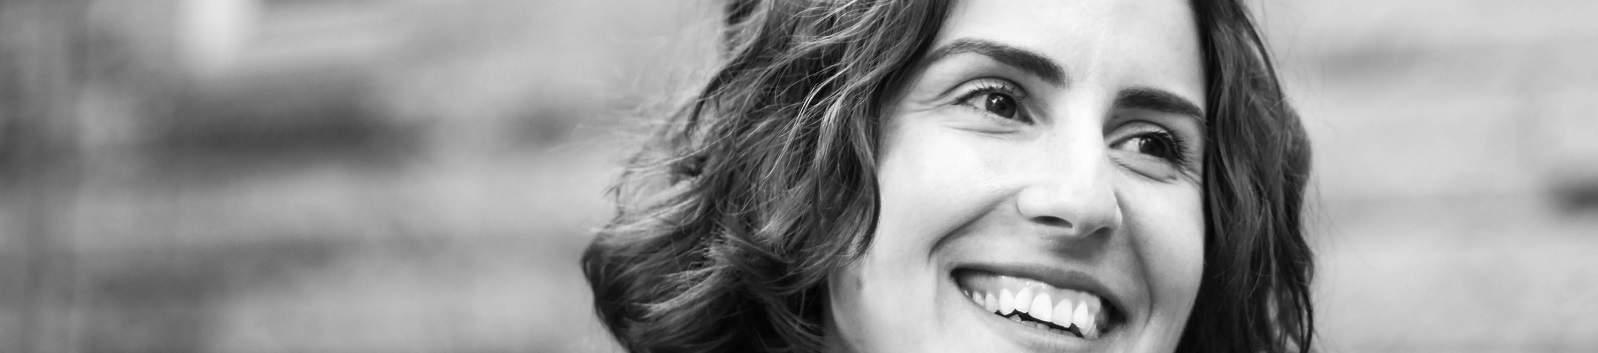 Optimisme als levenshouding in vijf stappen